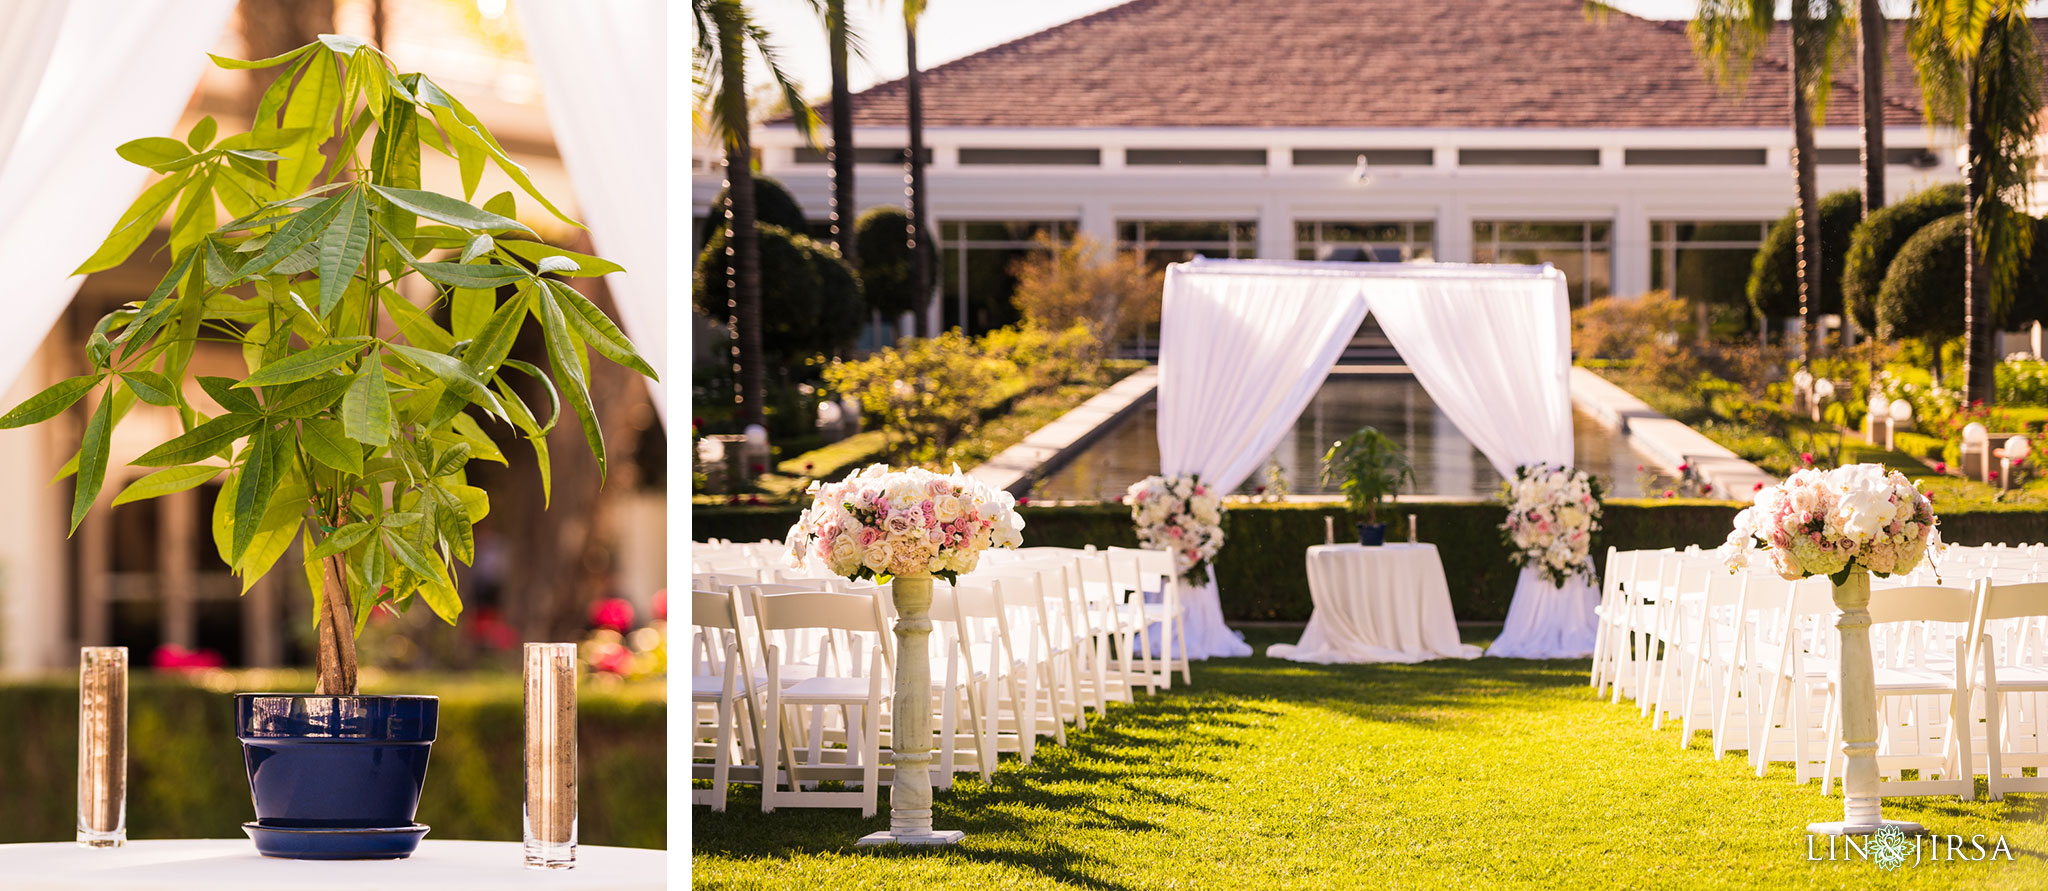 Richard Nixon Library Wedding | Karen & Ryan Beautiful Love Pictures For Facebook Timeline